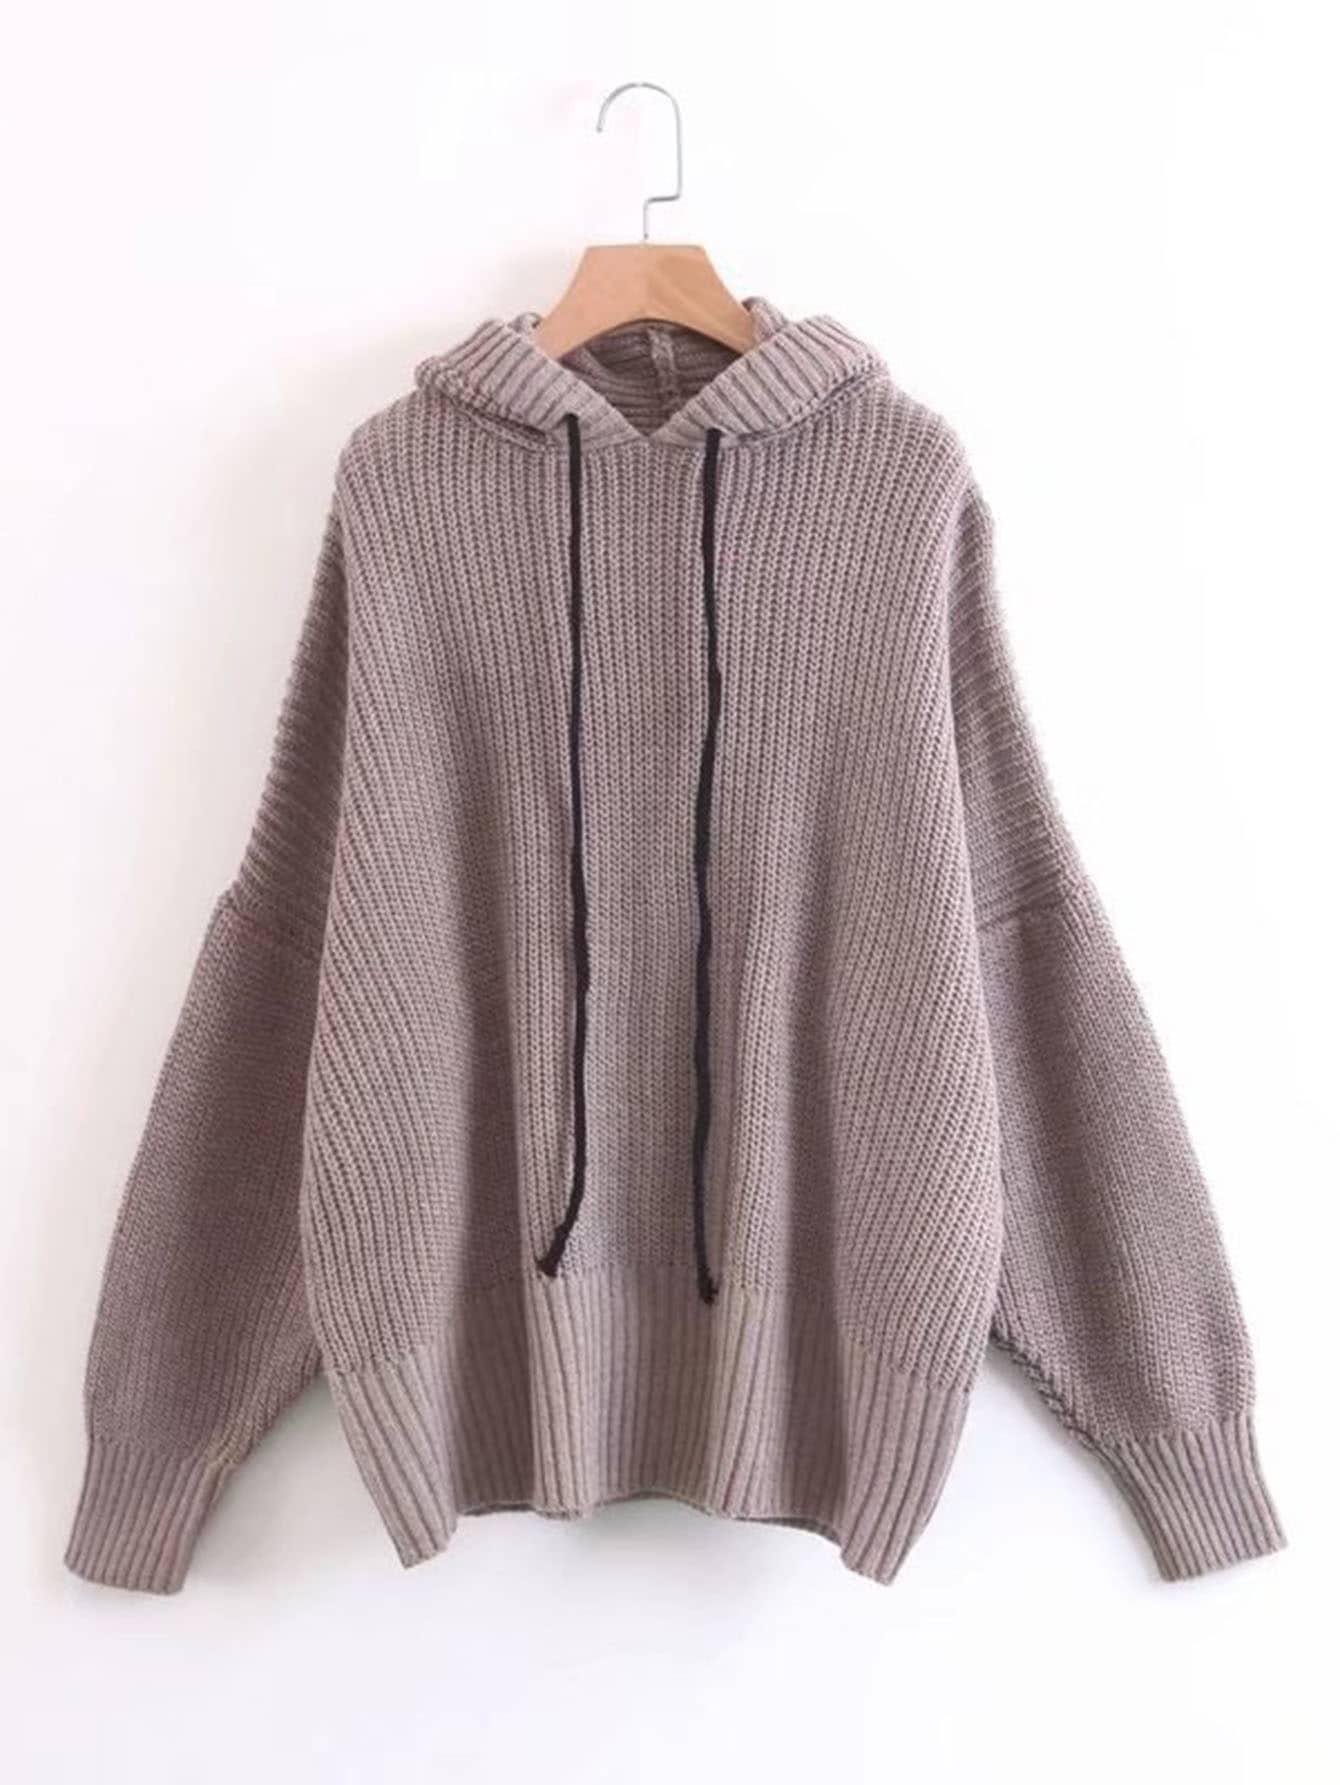 Drop Shoulder Ribbed Knit Hooded Sweater -SheIn(Sheinside)